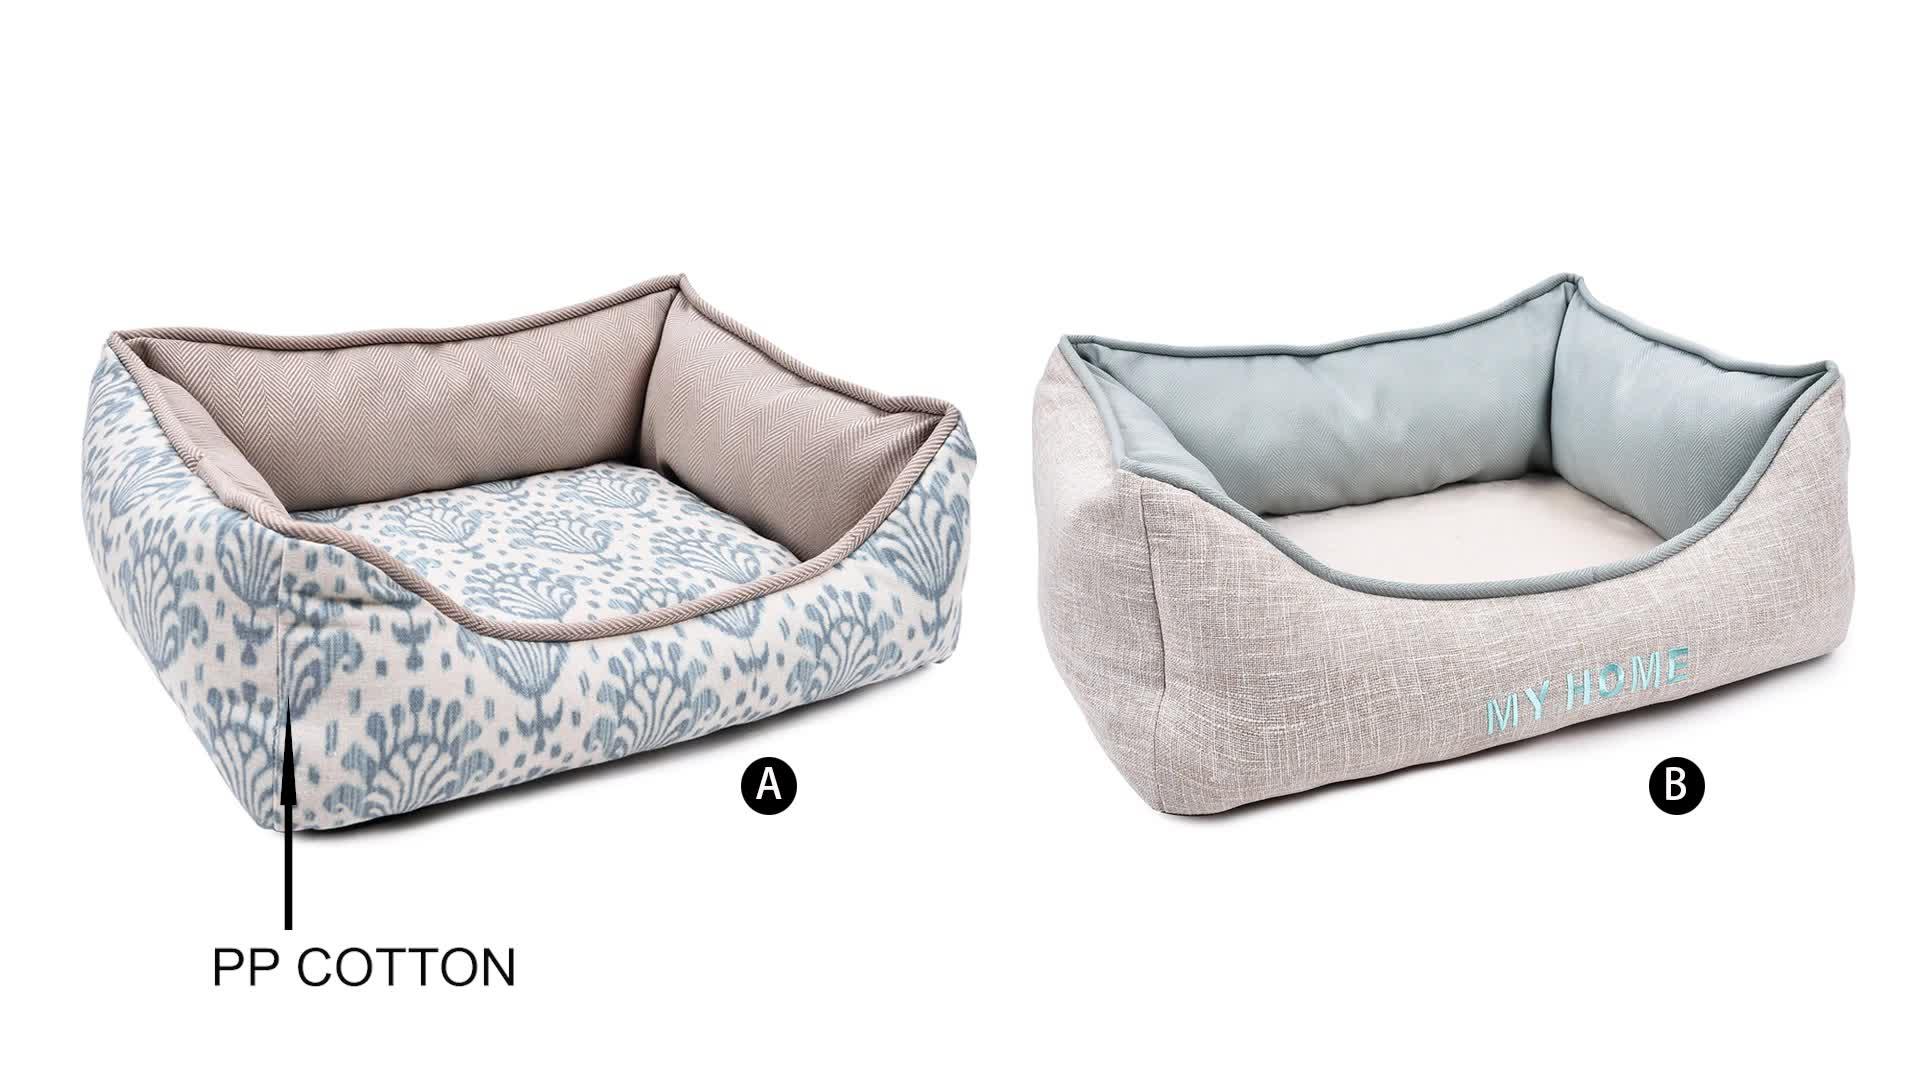 Tianyuan Memory Foam Pet Dog Bed,Foam Padded Luxury Pet Bed